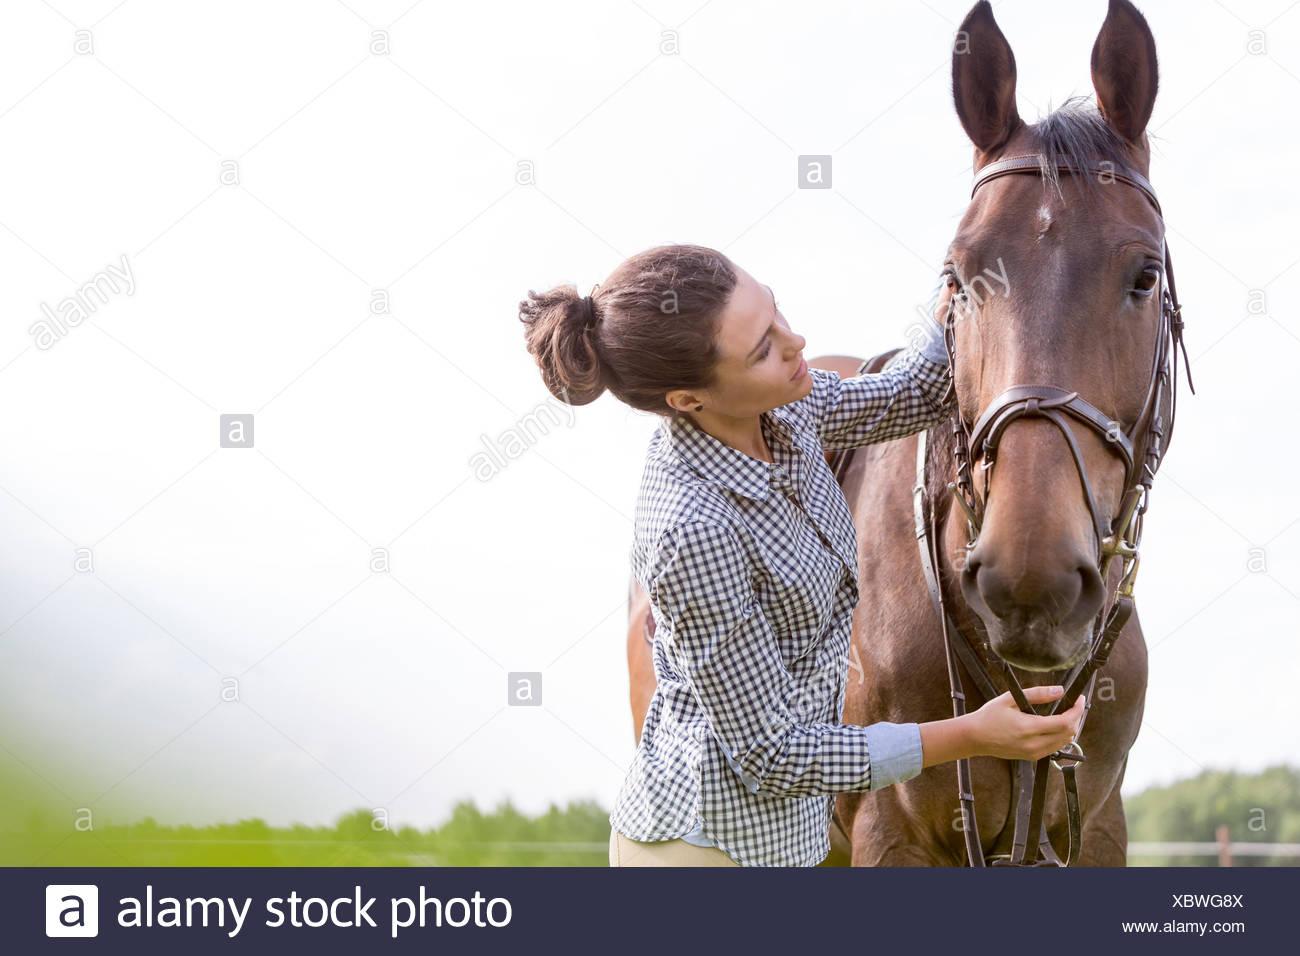 Woman petting horse - Stock Image